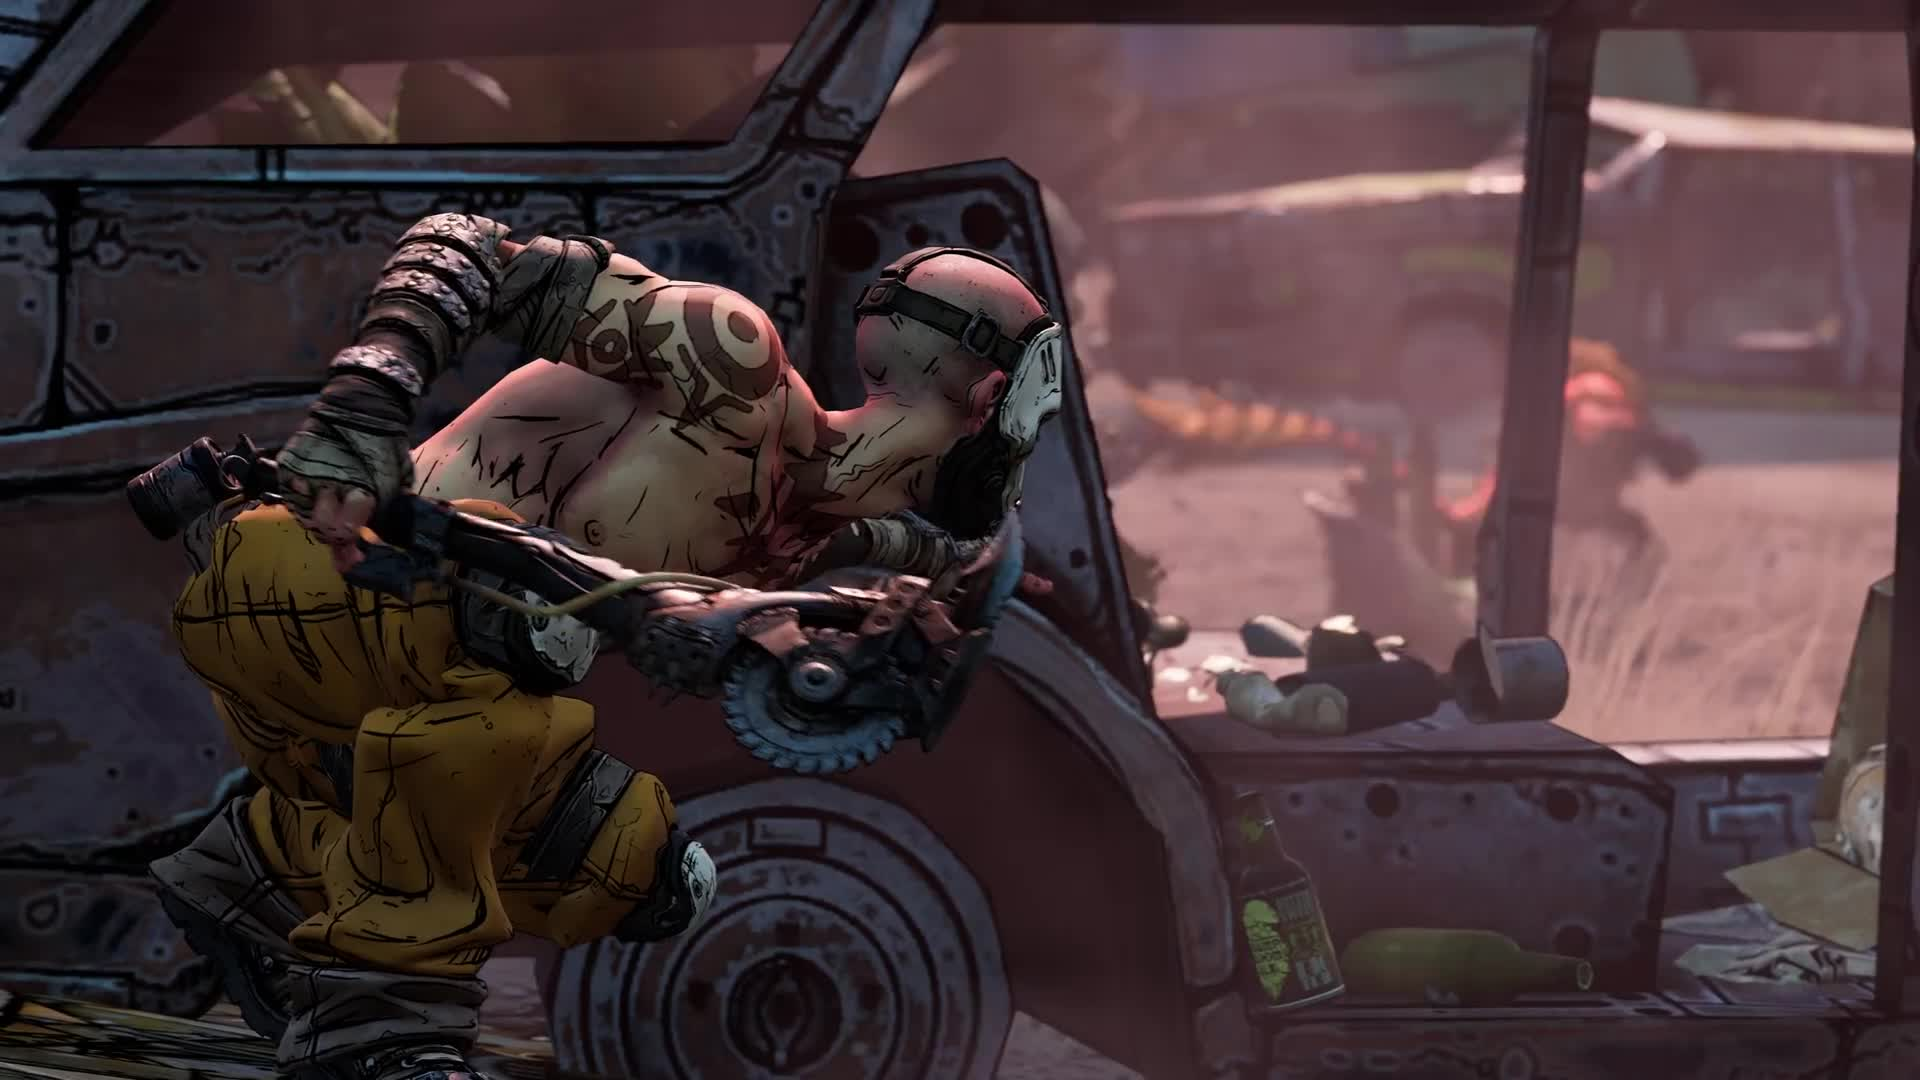 Borderlands 3 - FL4K Character Trailer - The Hunt [HD] screen capture